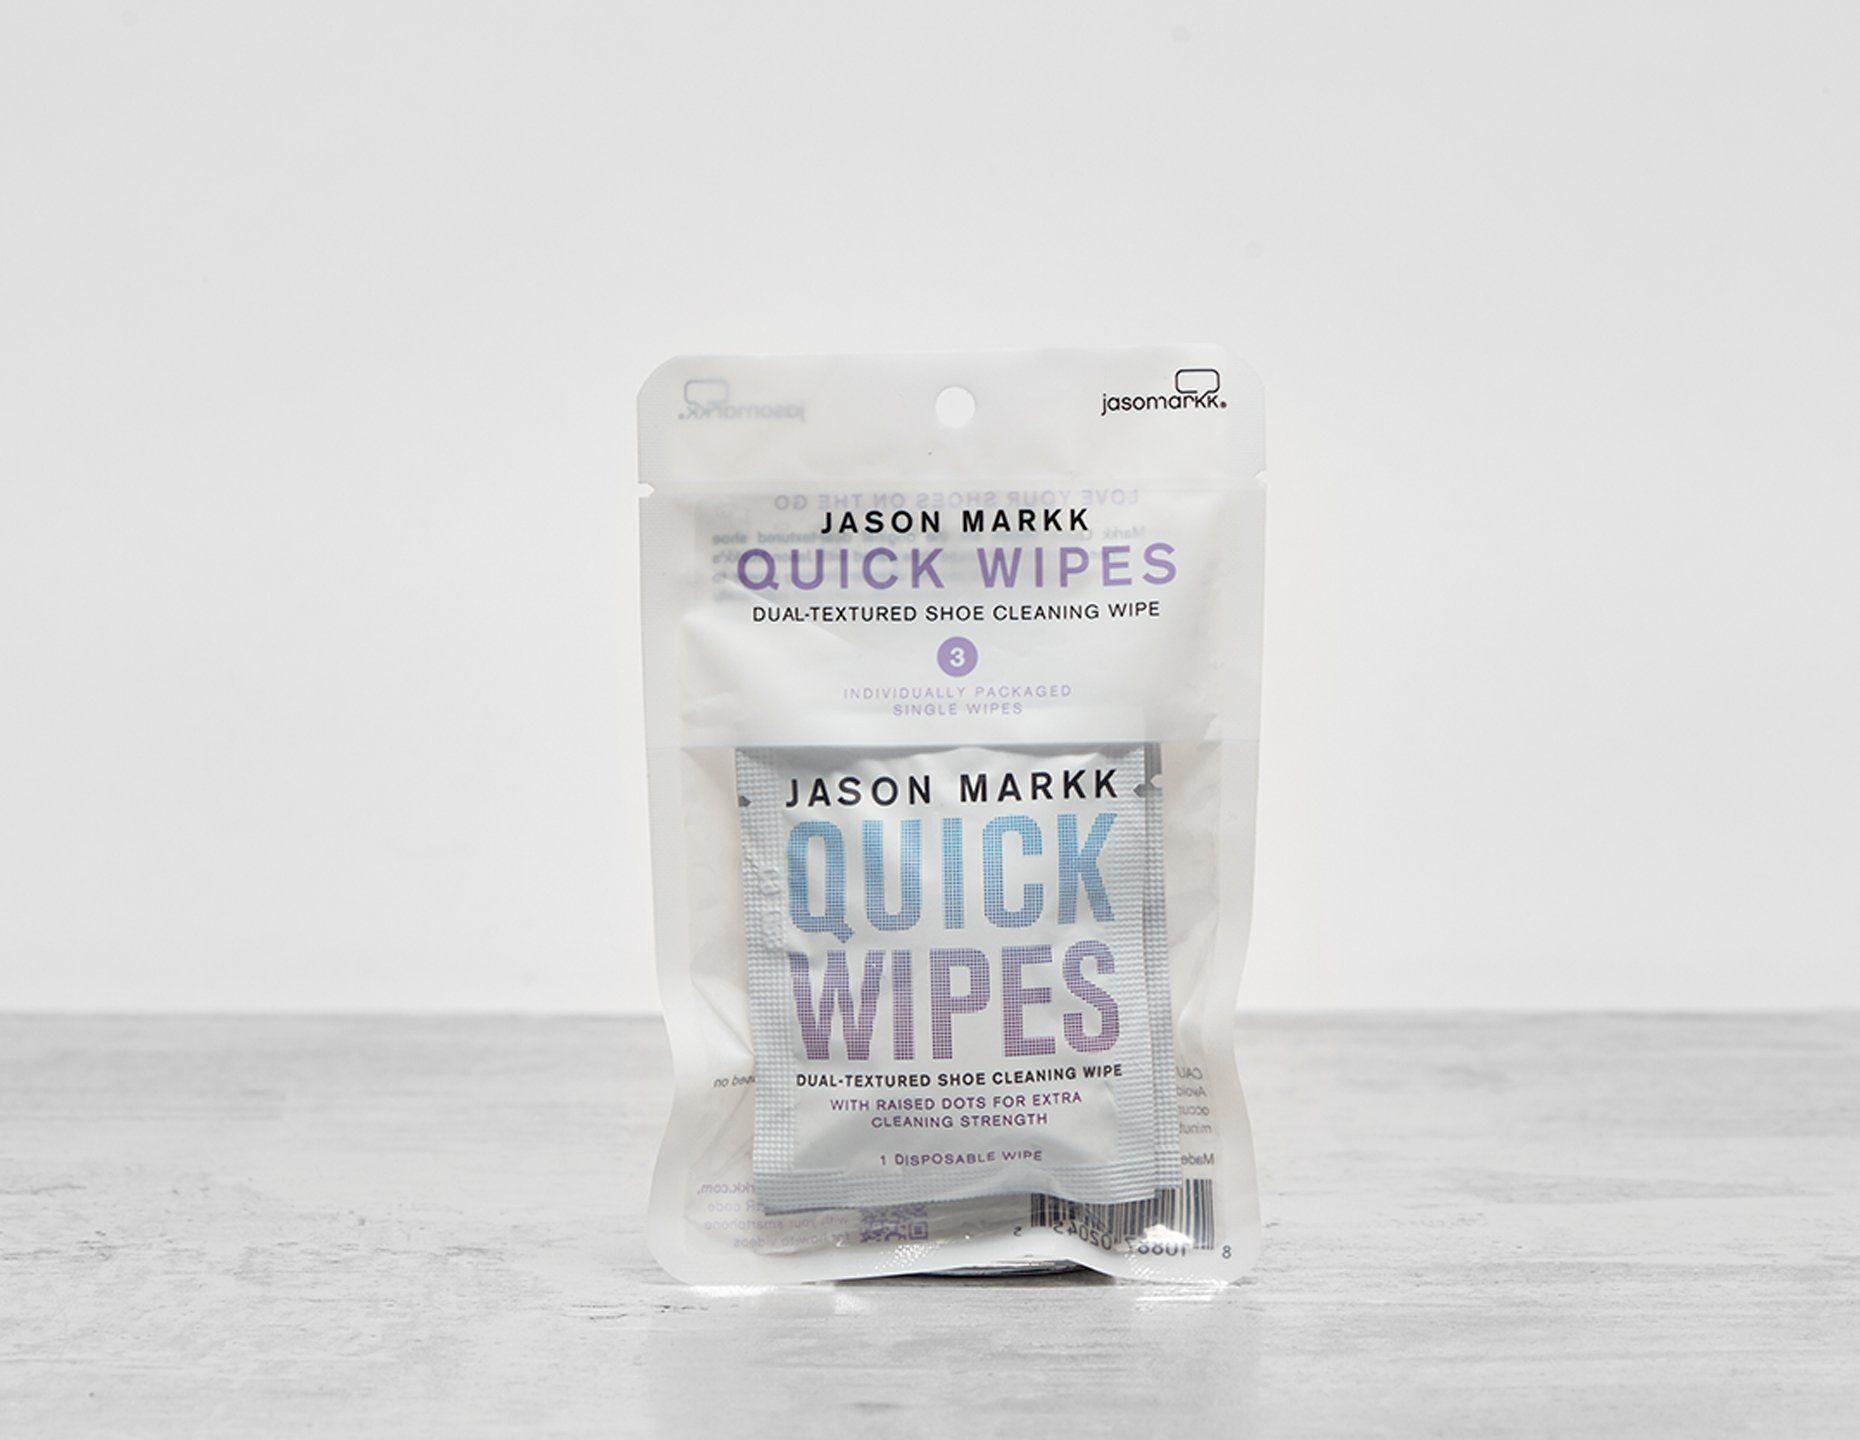 Jason Markk Quick Wipes 3 Pack